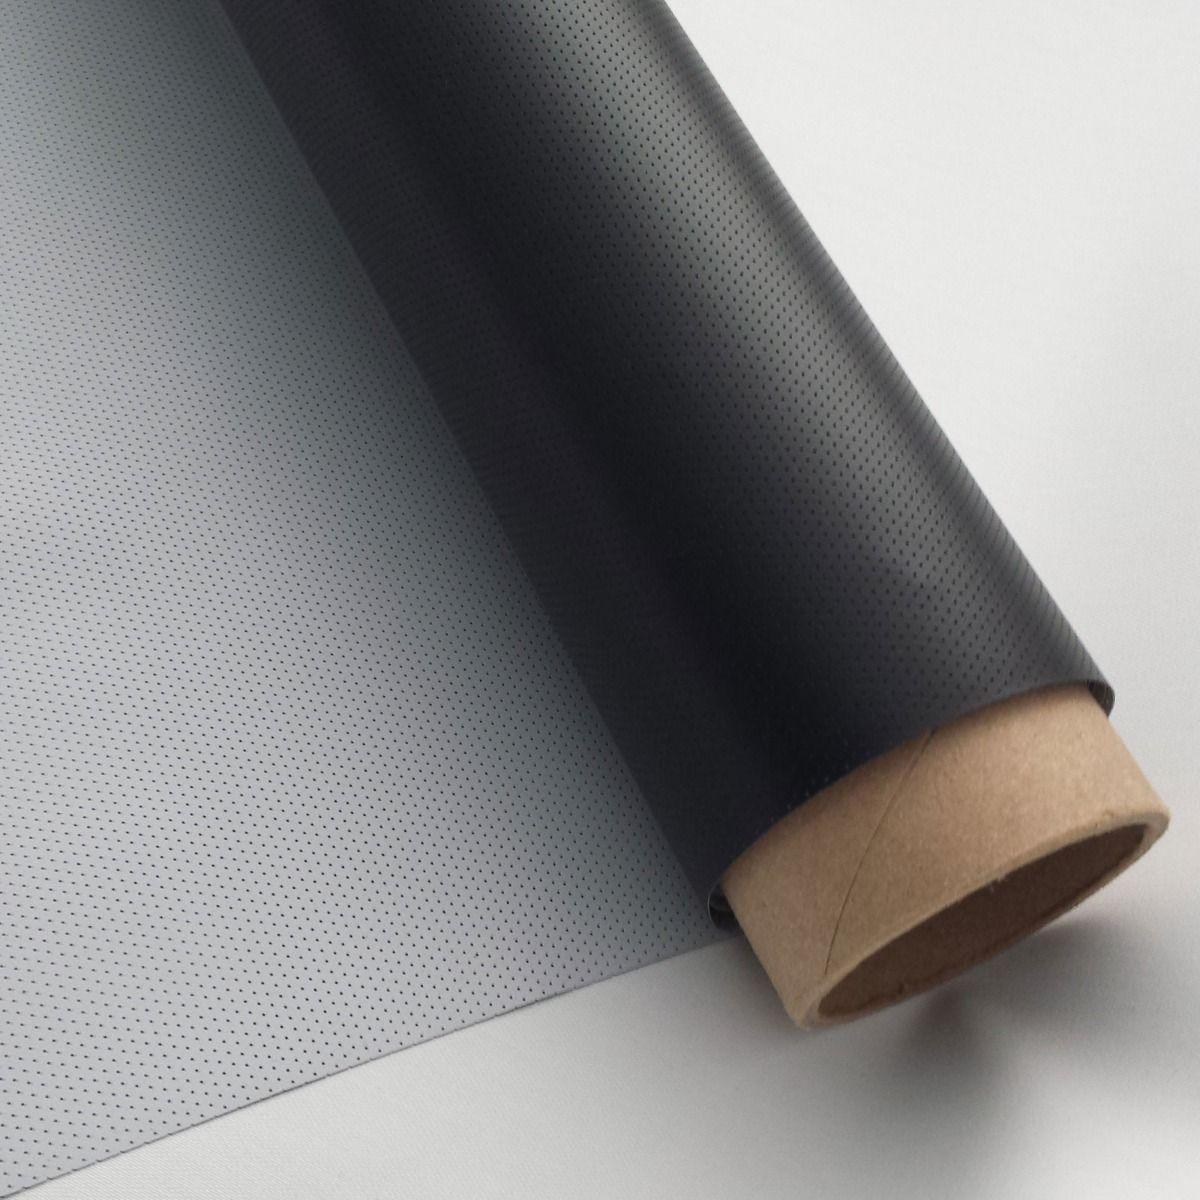 Nano FlexiGray Material Shipped in a Tube